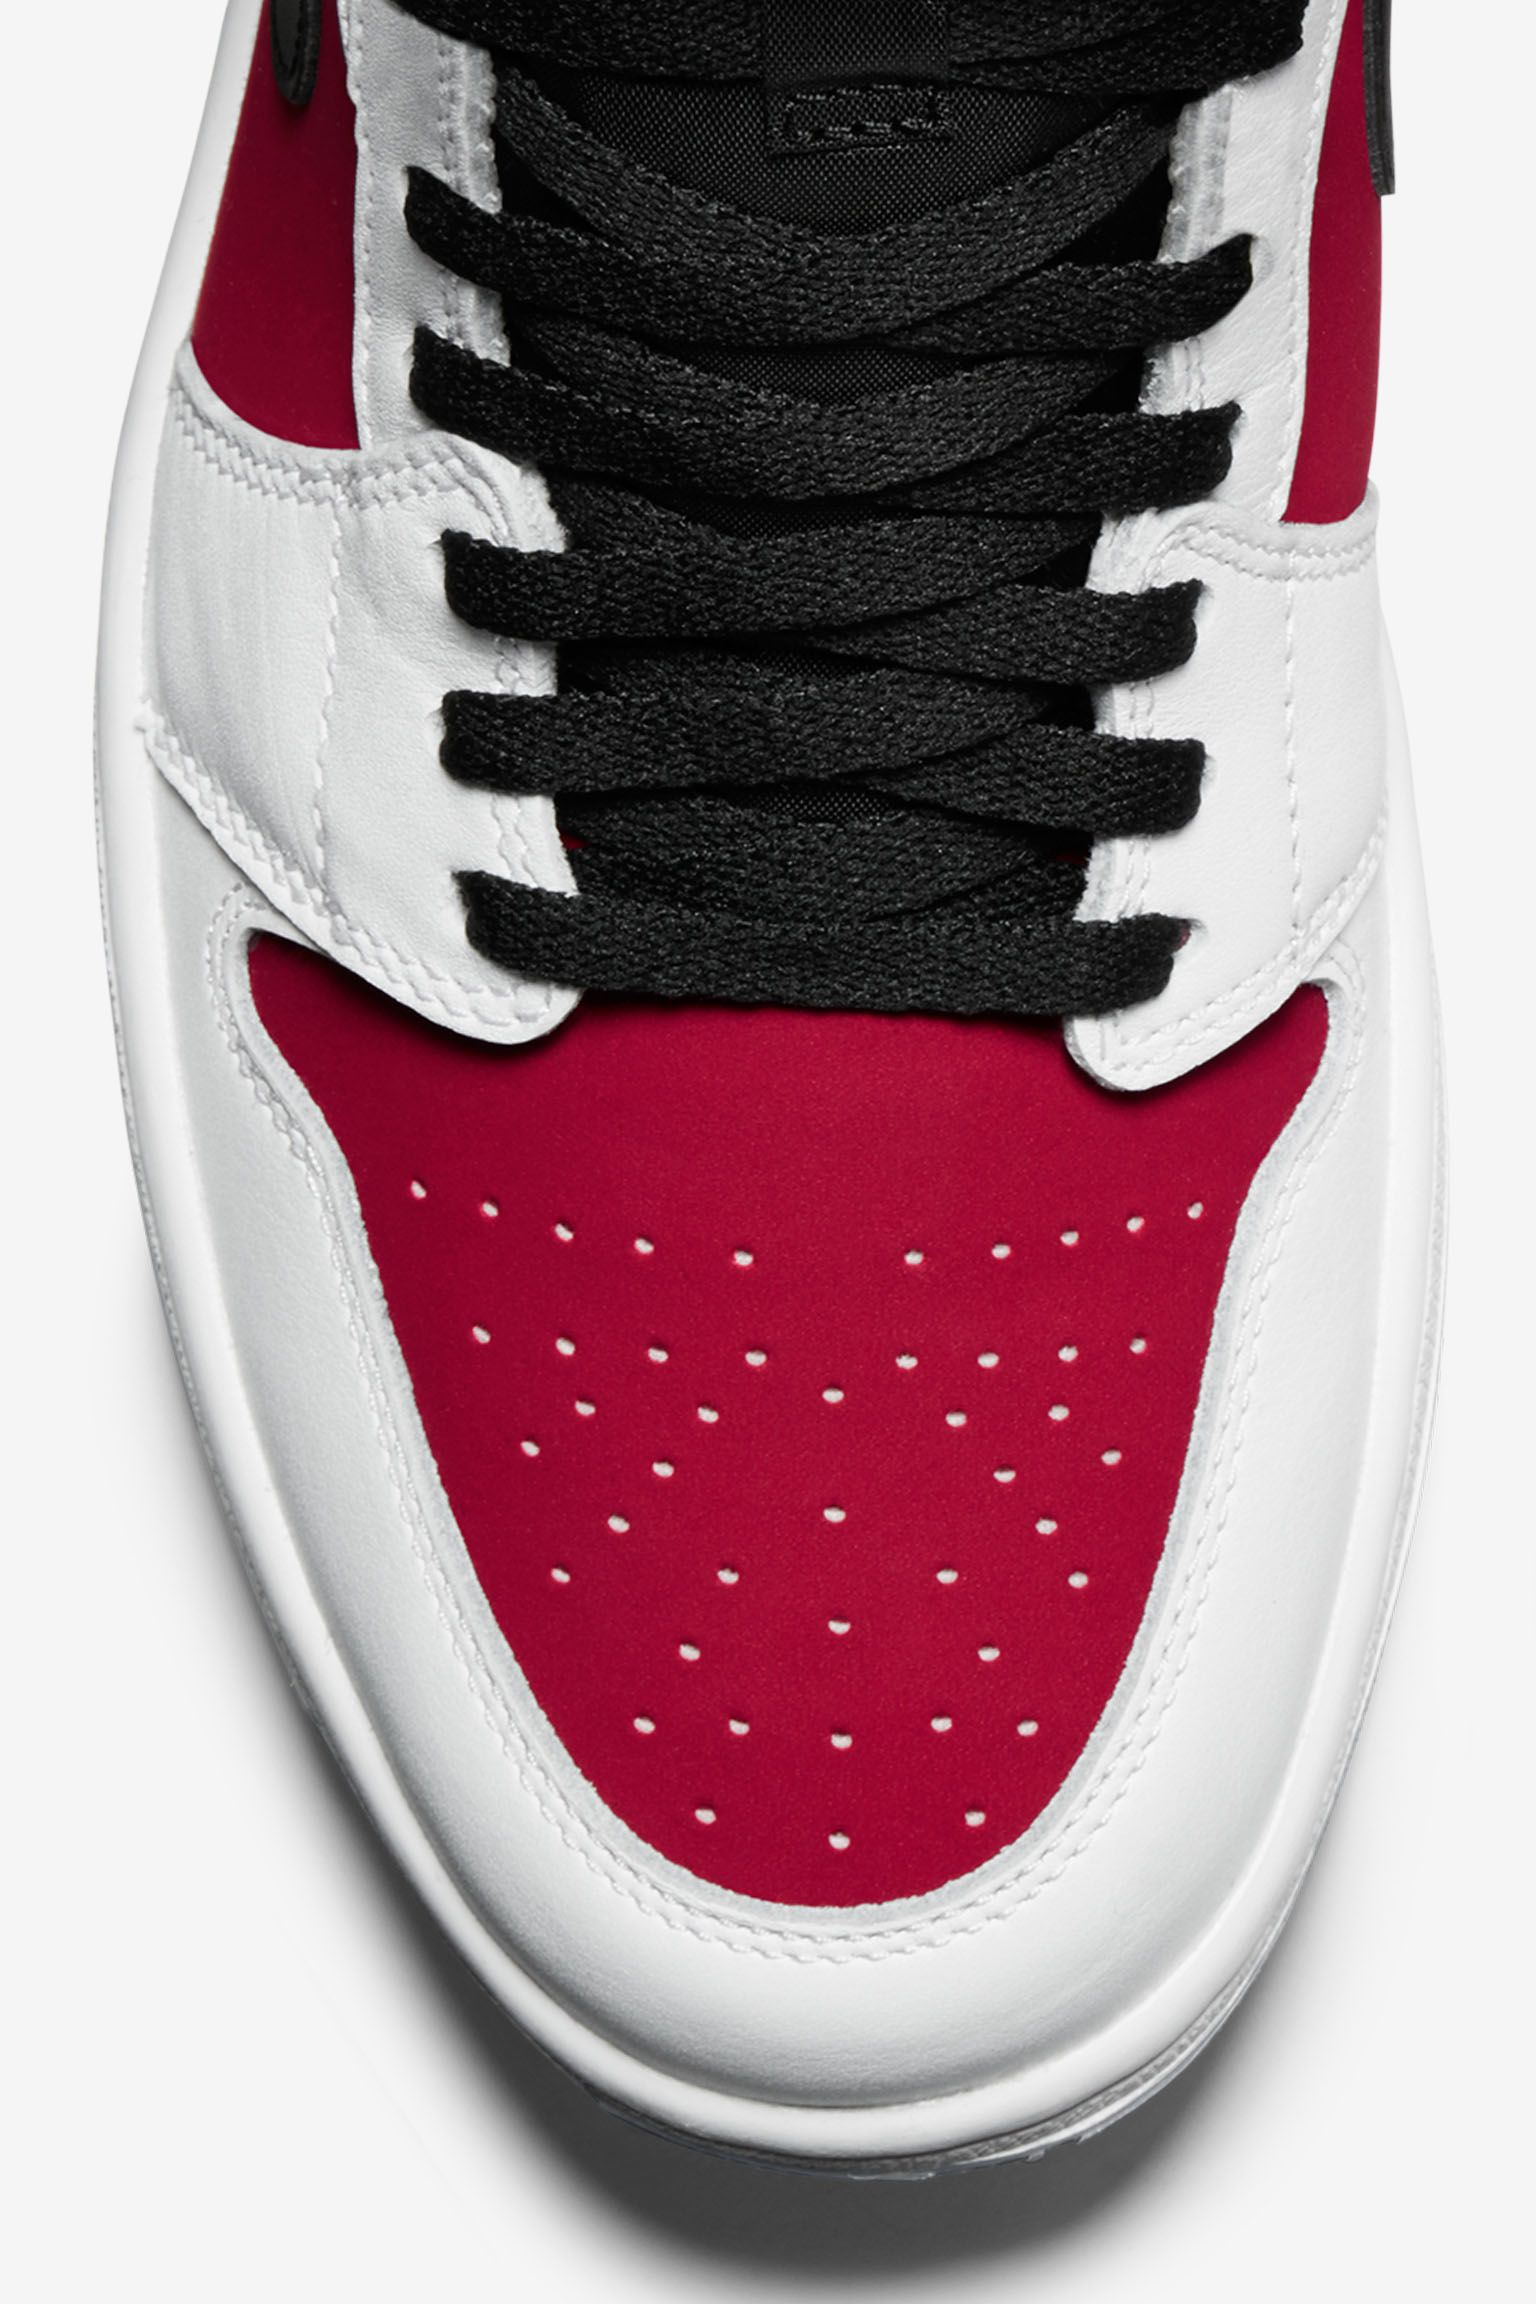 Air Jordan 1 Retro 'Carmine'